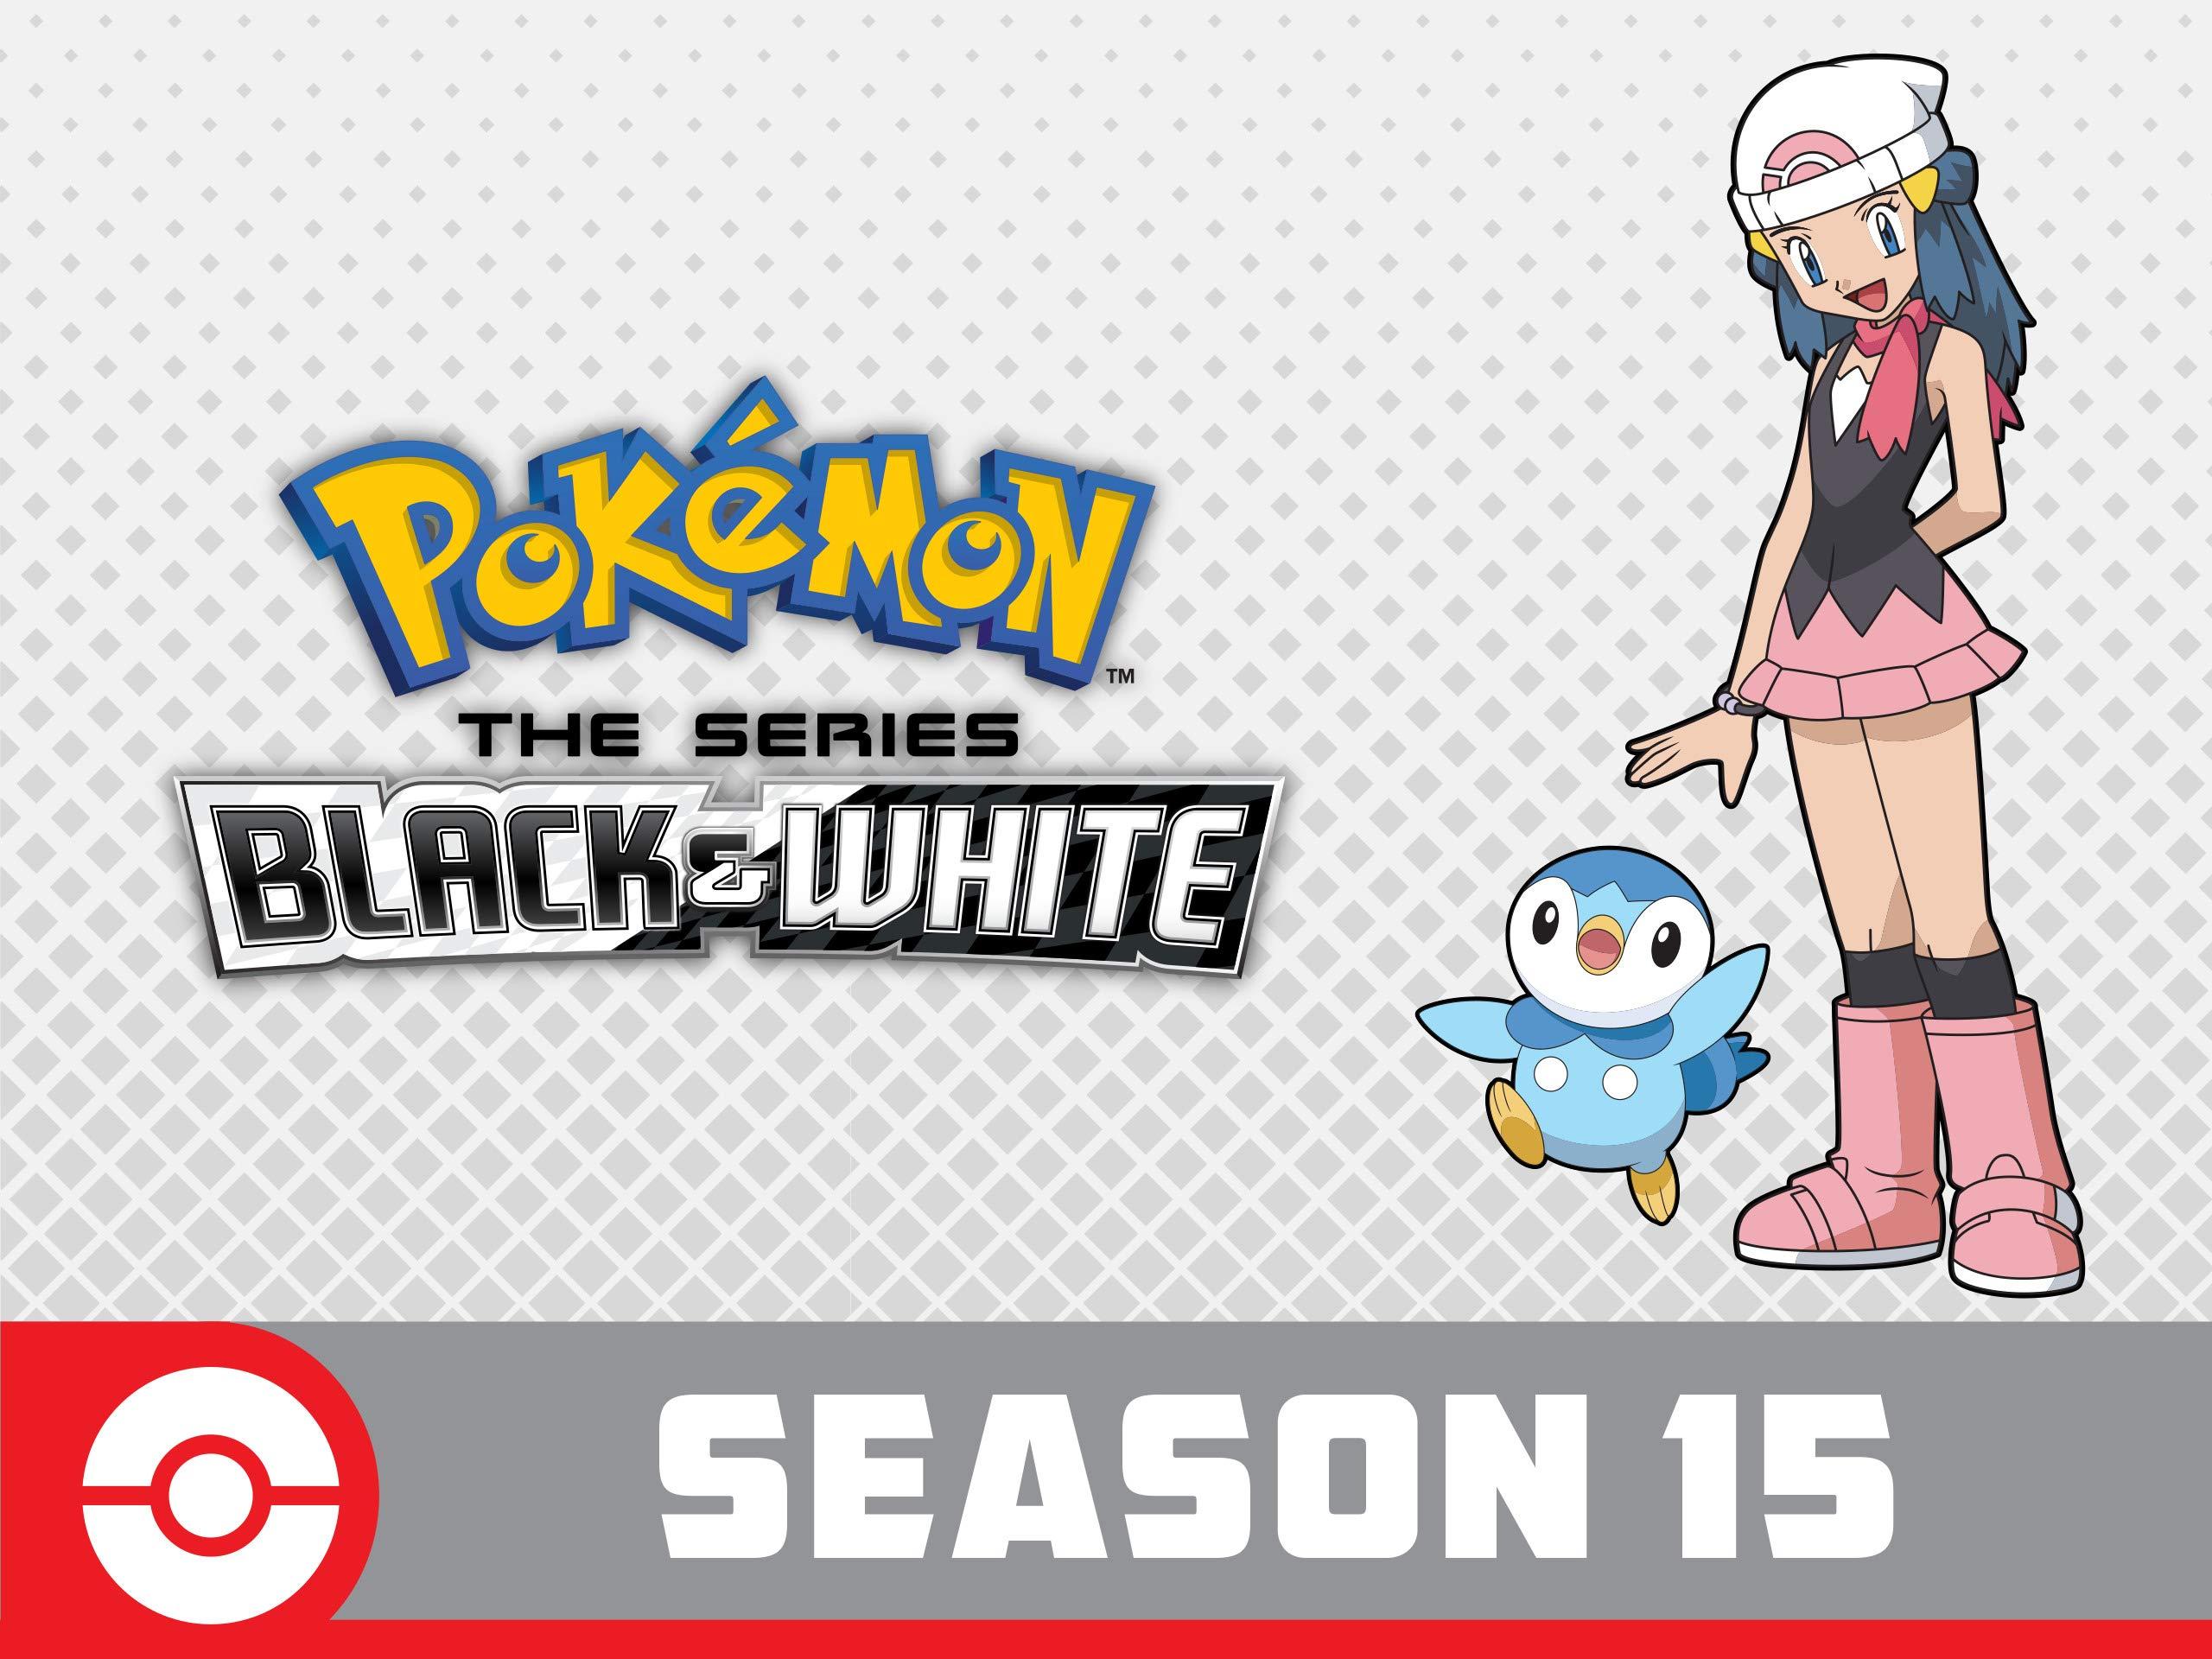 Watch Pokemon The Series Black And White Full Season Prime Video What ivs has zorua, when you receive it in driftveil city? black and white full season